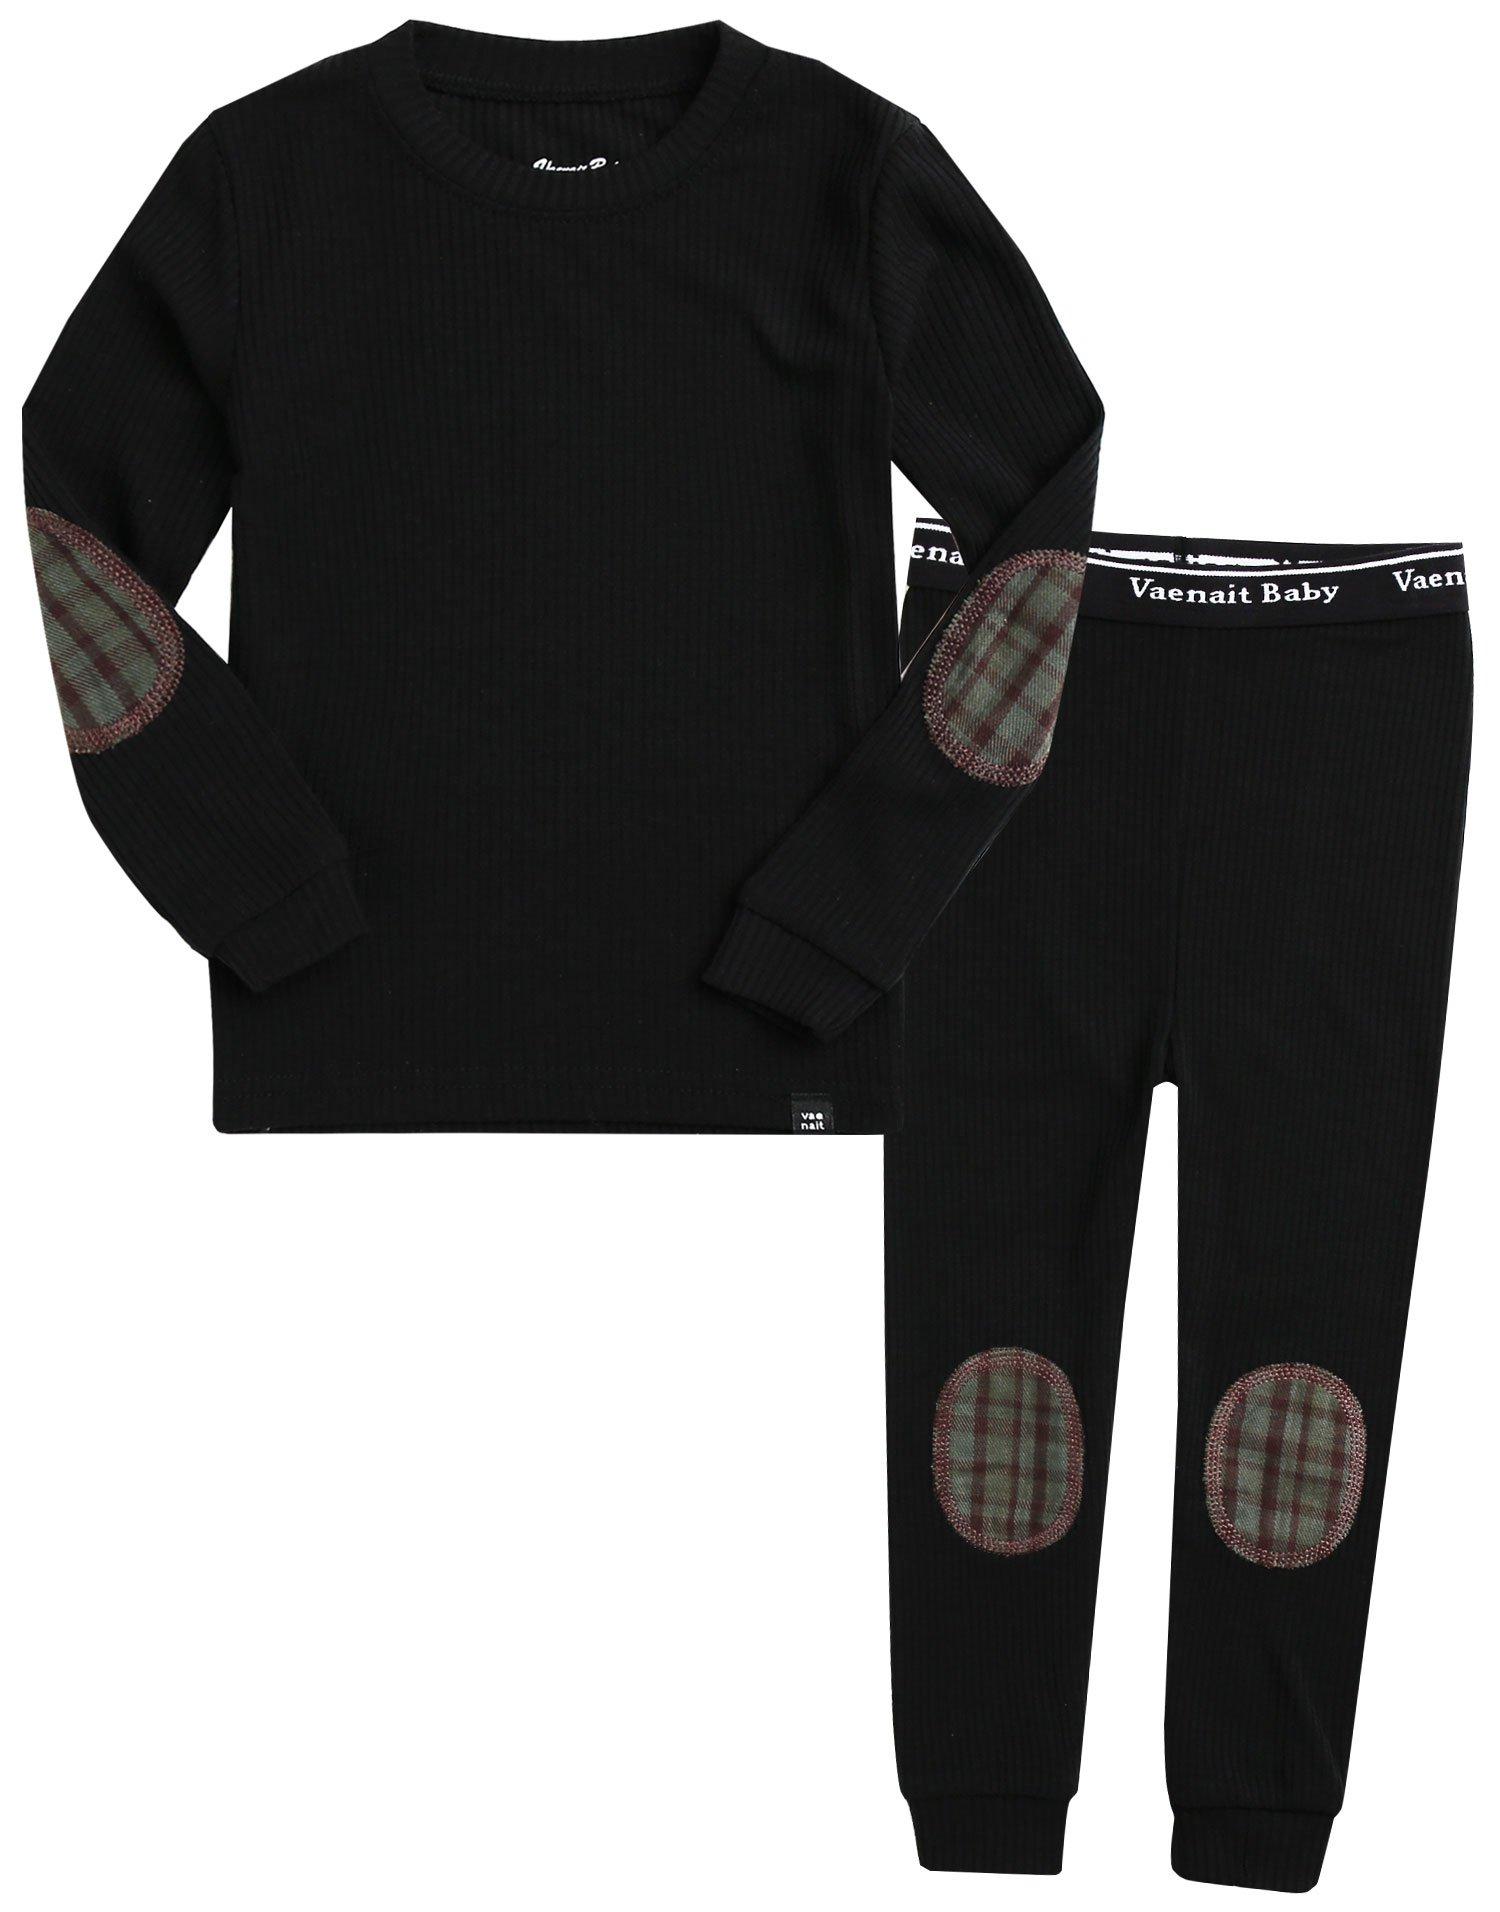 Vaenait baby Kids Boys Sleepwear Pajamas 2pcs Set Maple Patch Black M